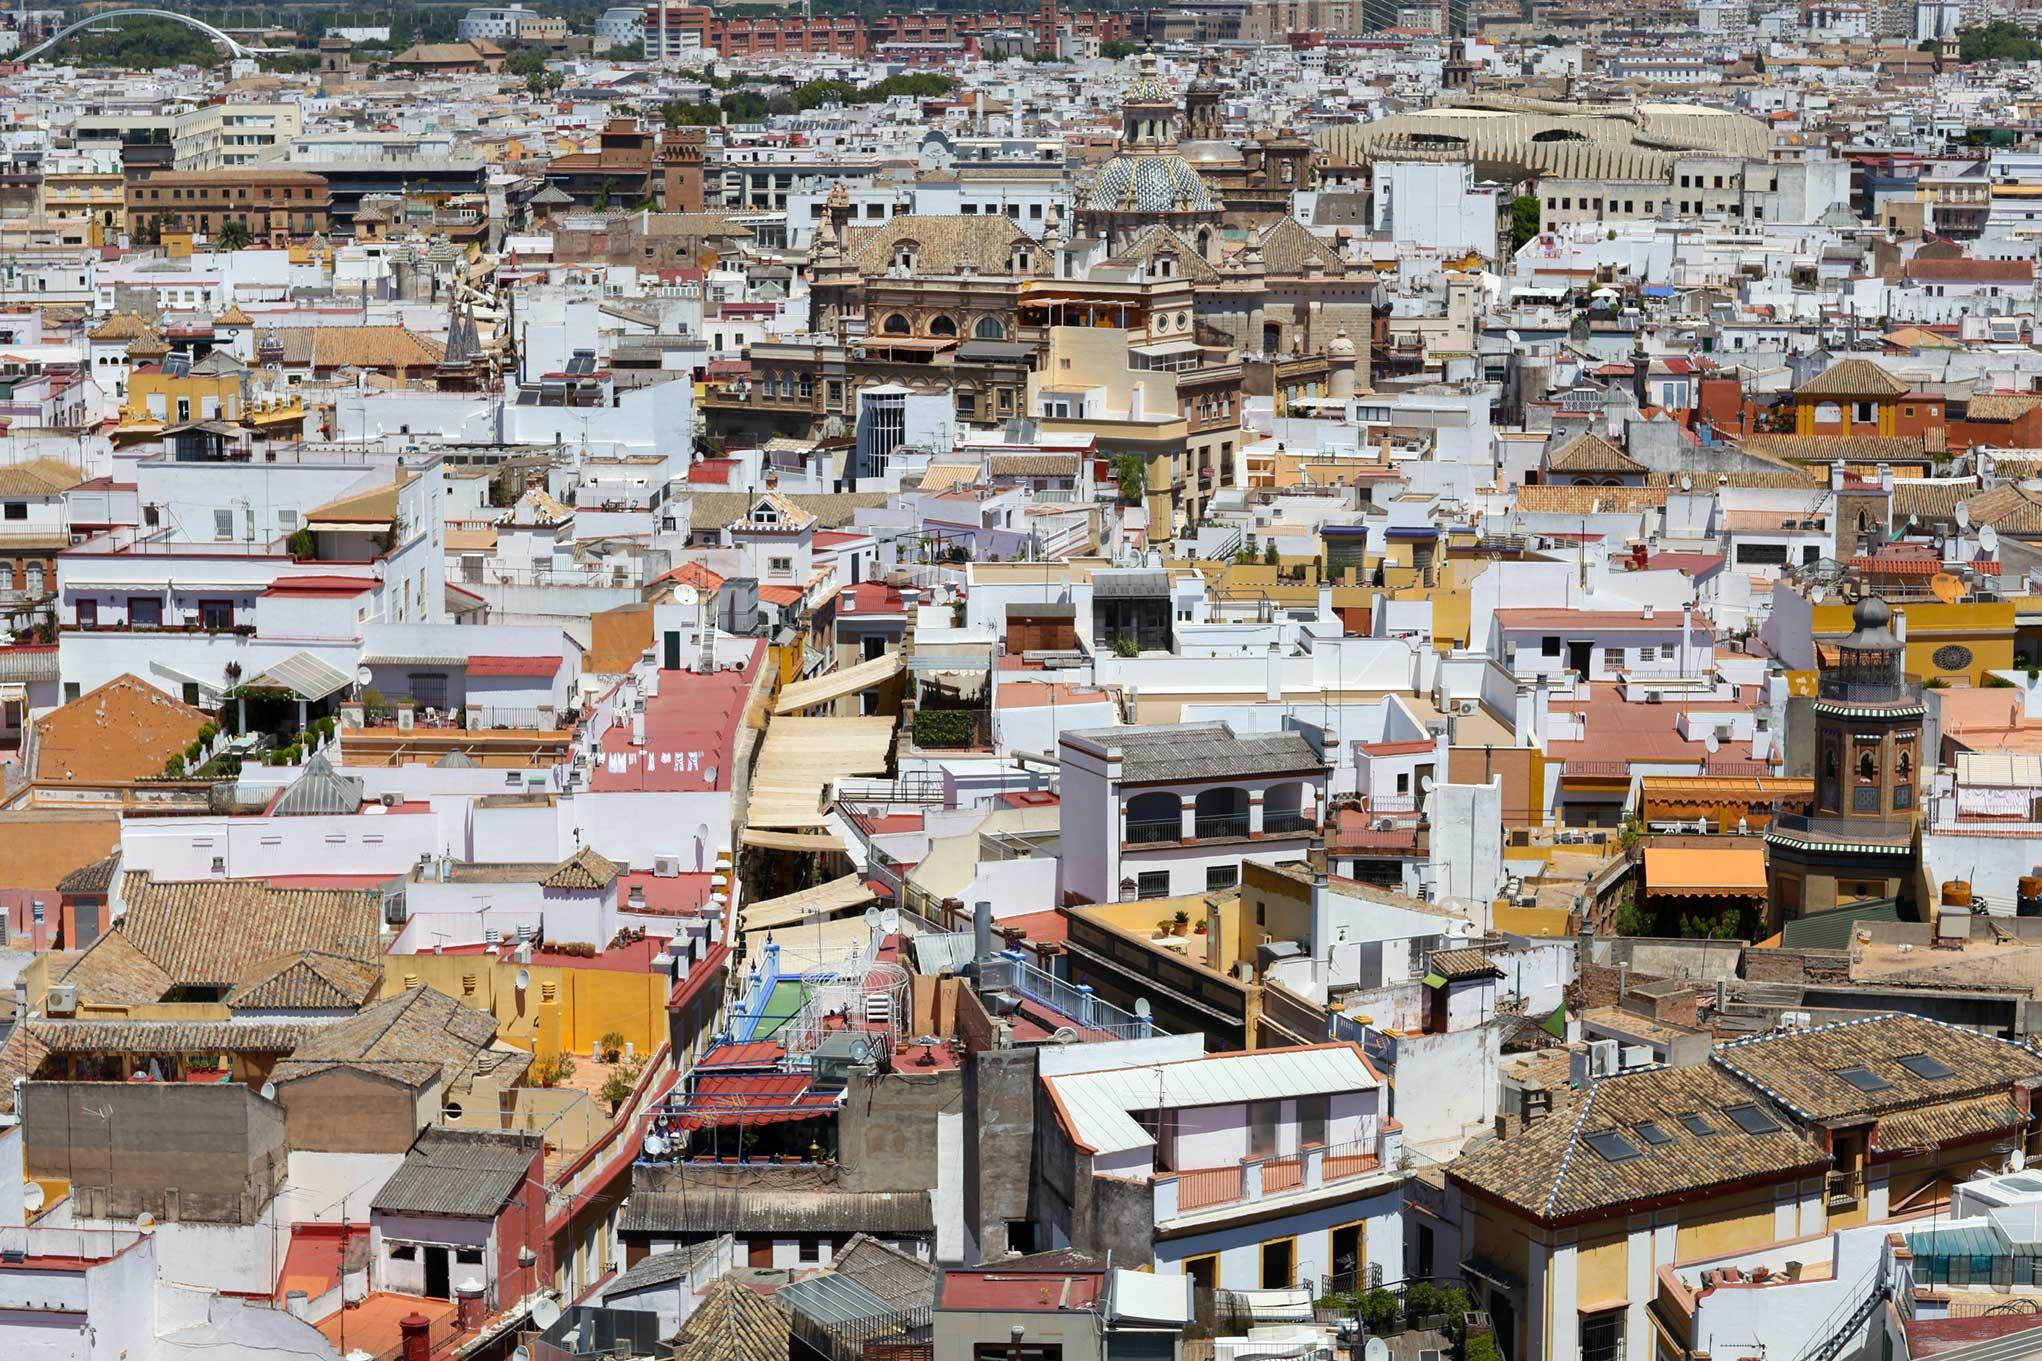 fabl_rooftops_seville.jpg